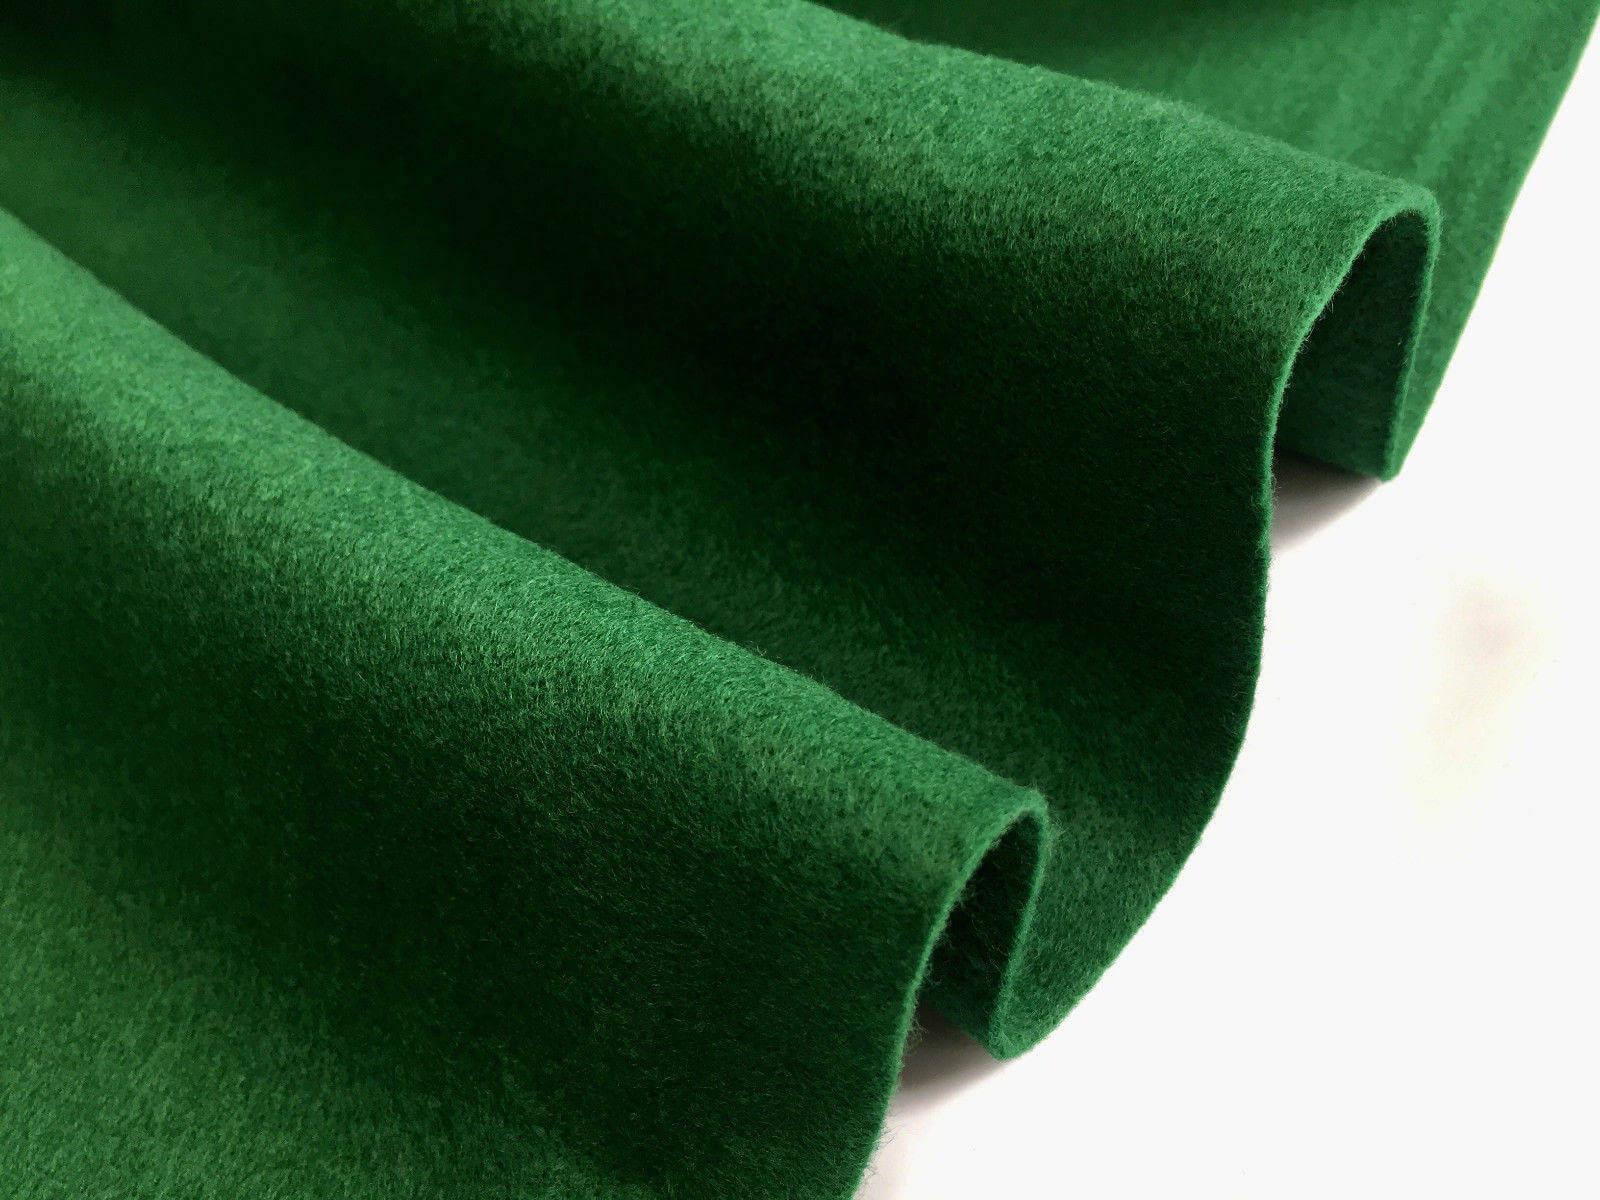 felt-fabric-material-craft-plain-colours-polyester-102cm-wide-dark-green-5ace60b31.jpg